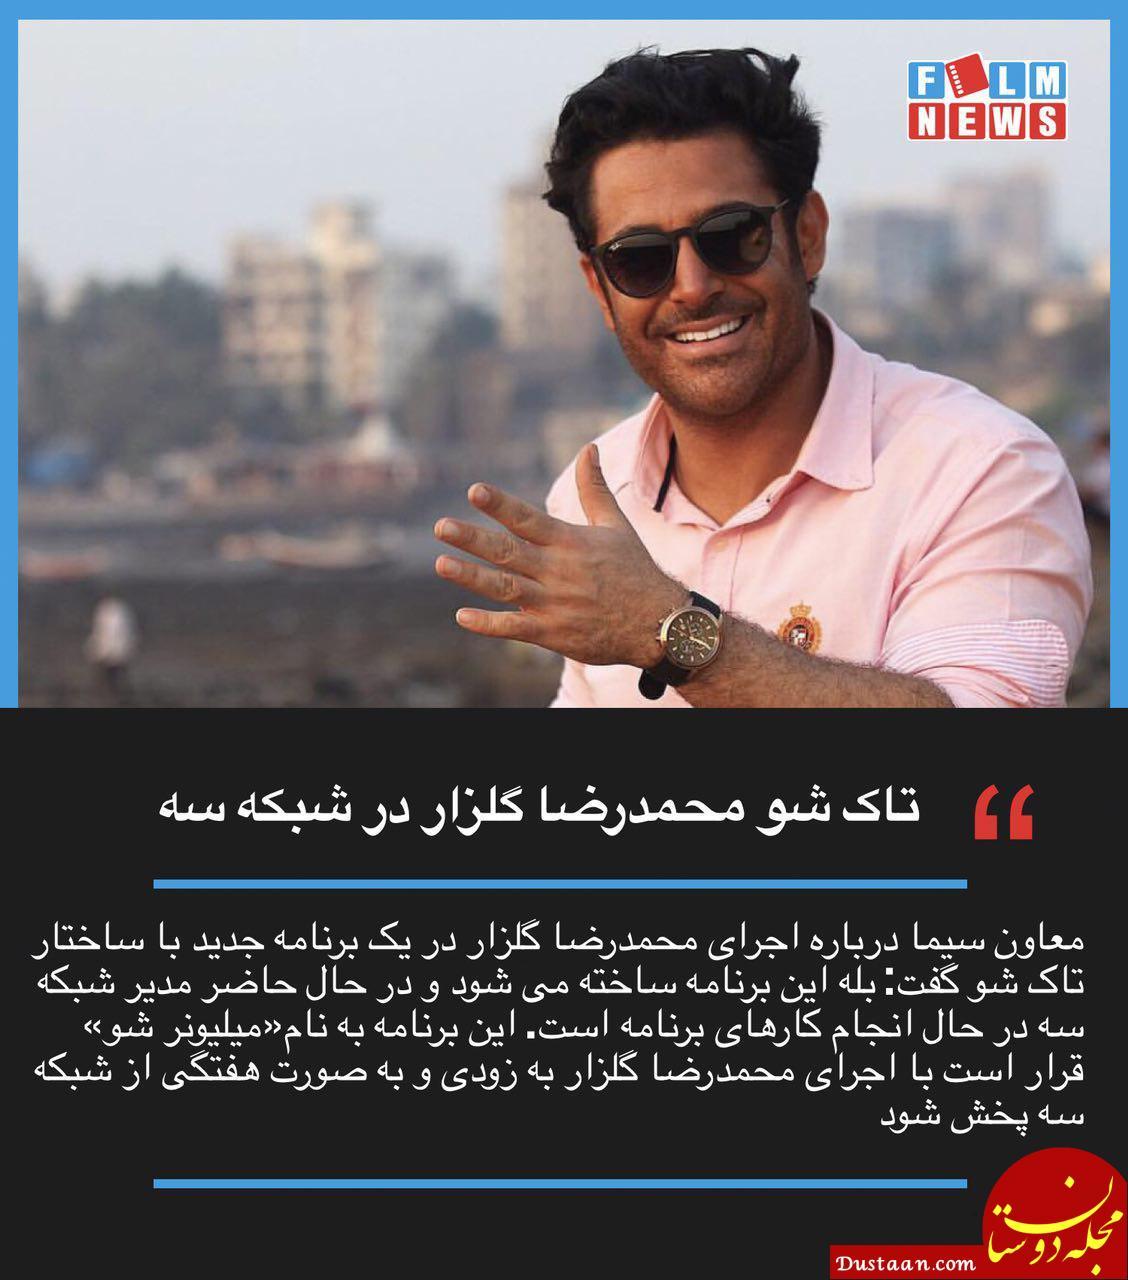 www.dustaan.com تاک شوی رضا گلزار در راه شبکه سه +عکس